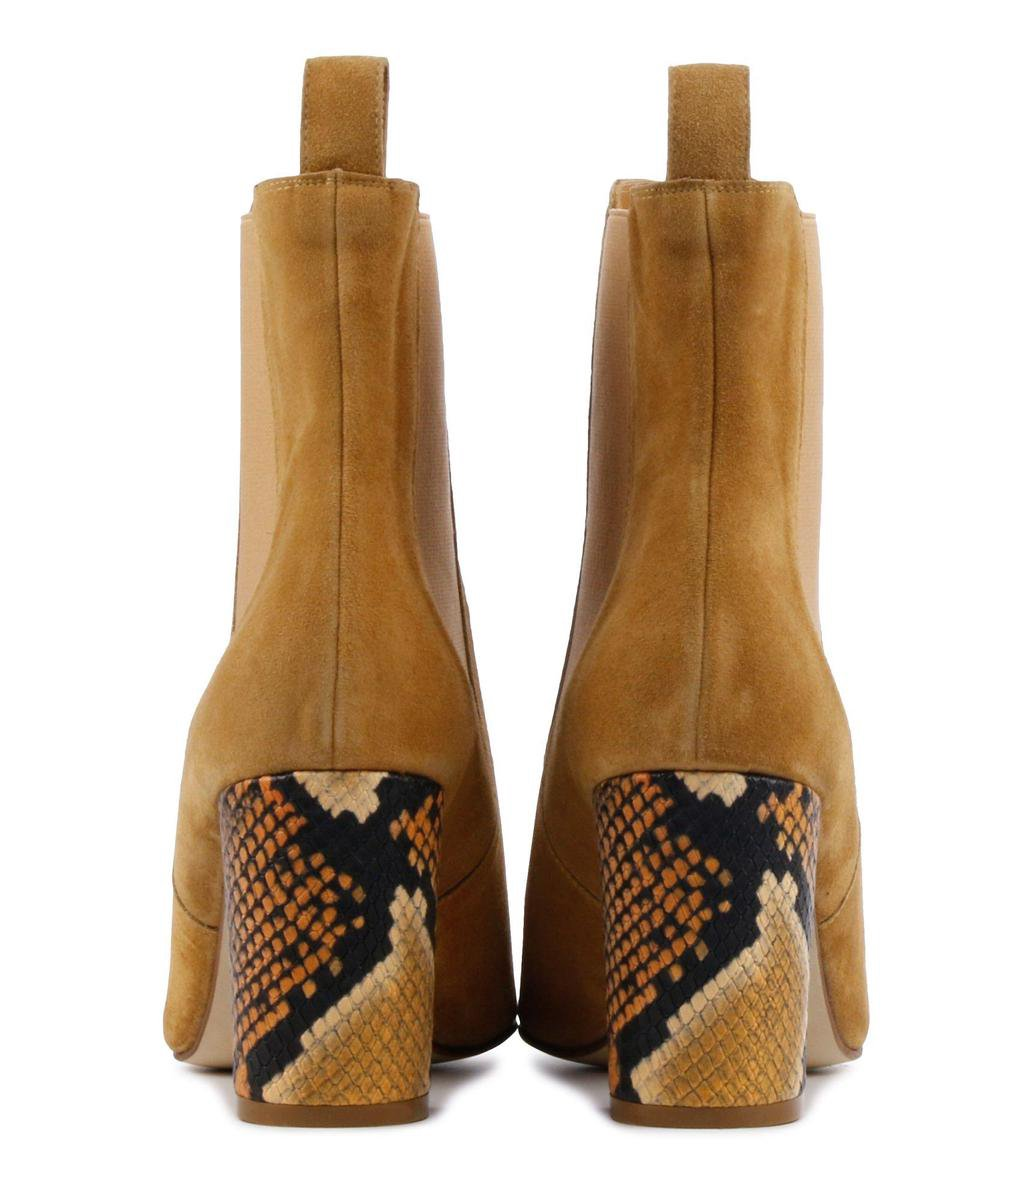 Pertini Vrouwen Enkellaarsjes -  17089 - Camel - Maat 36 Enkellaarsjes